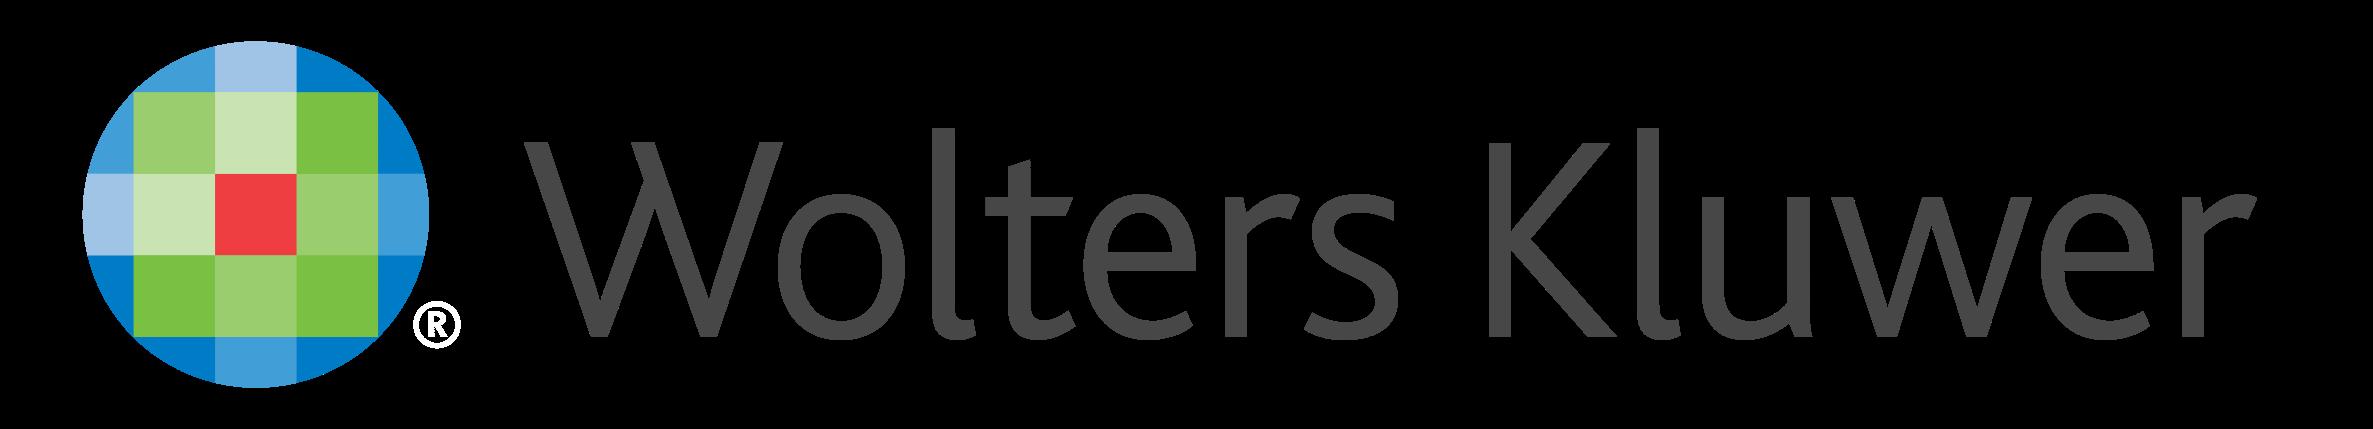 Wolters_Kluwer_logo_logotype (1)